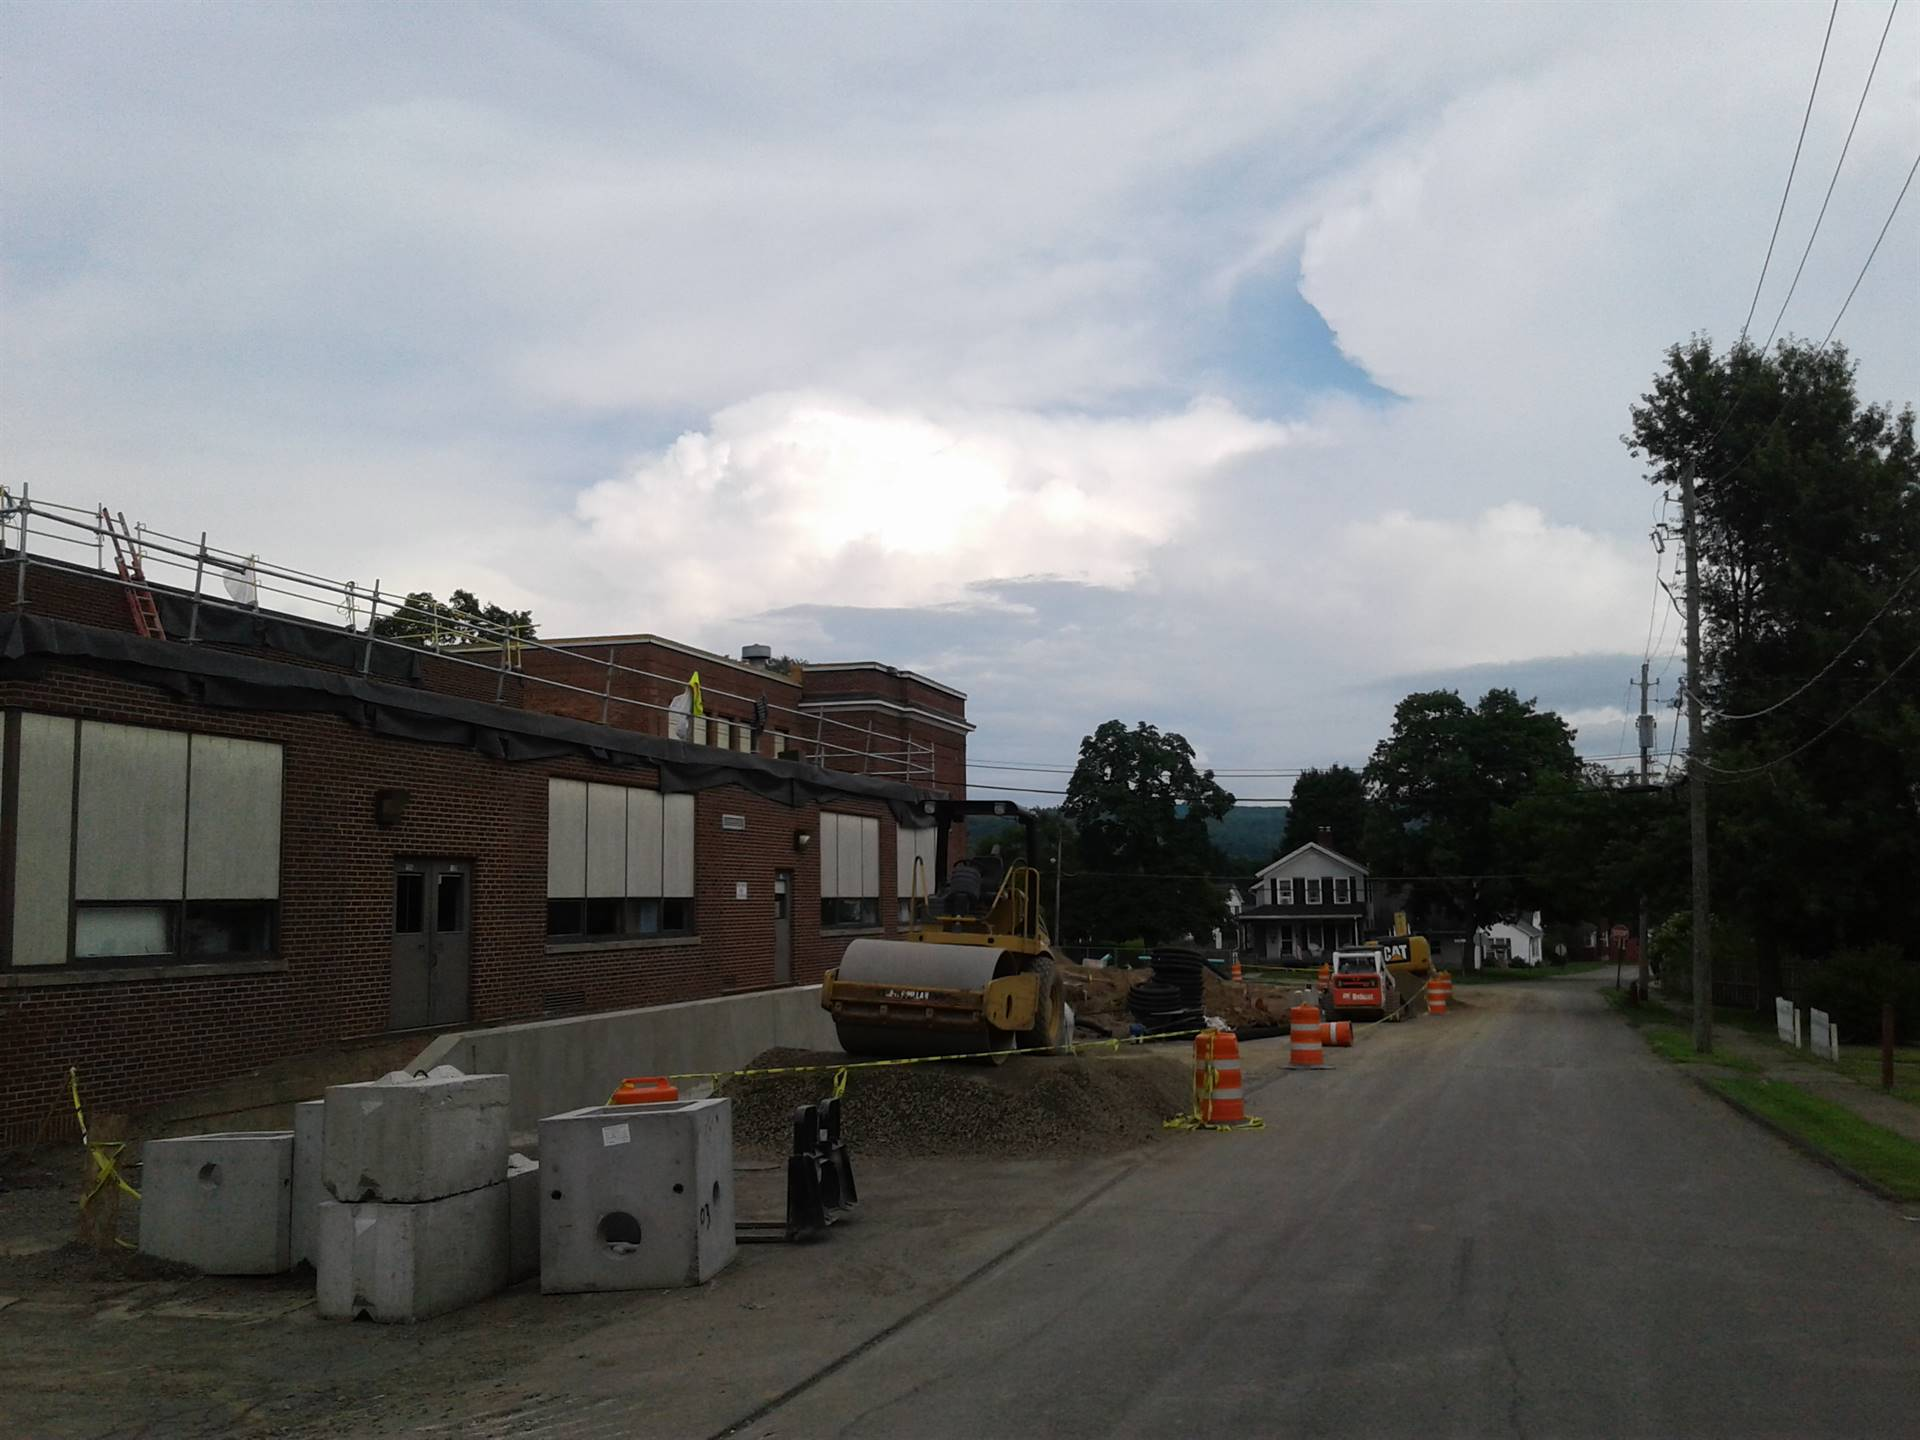 Week of Aug 10 - High School  - Walnut Street